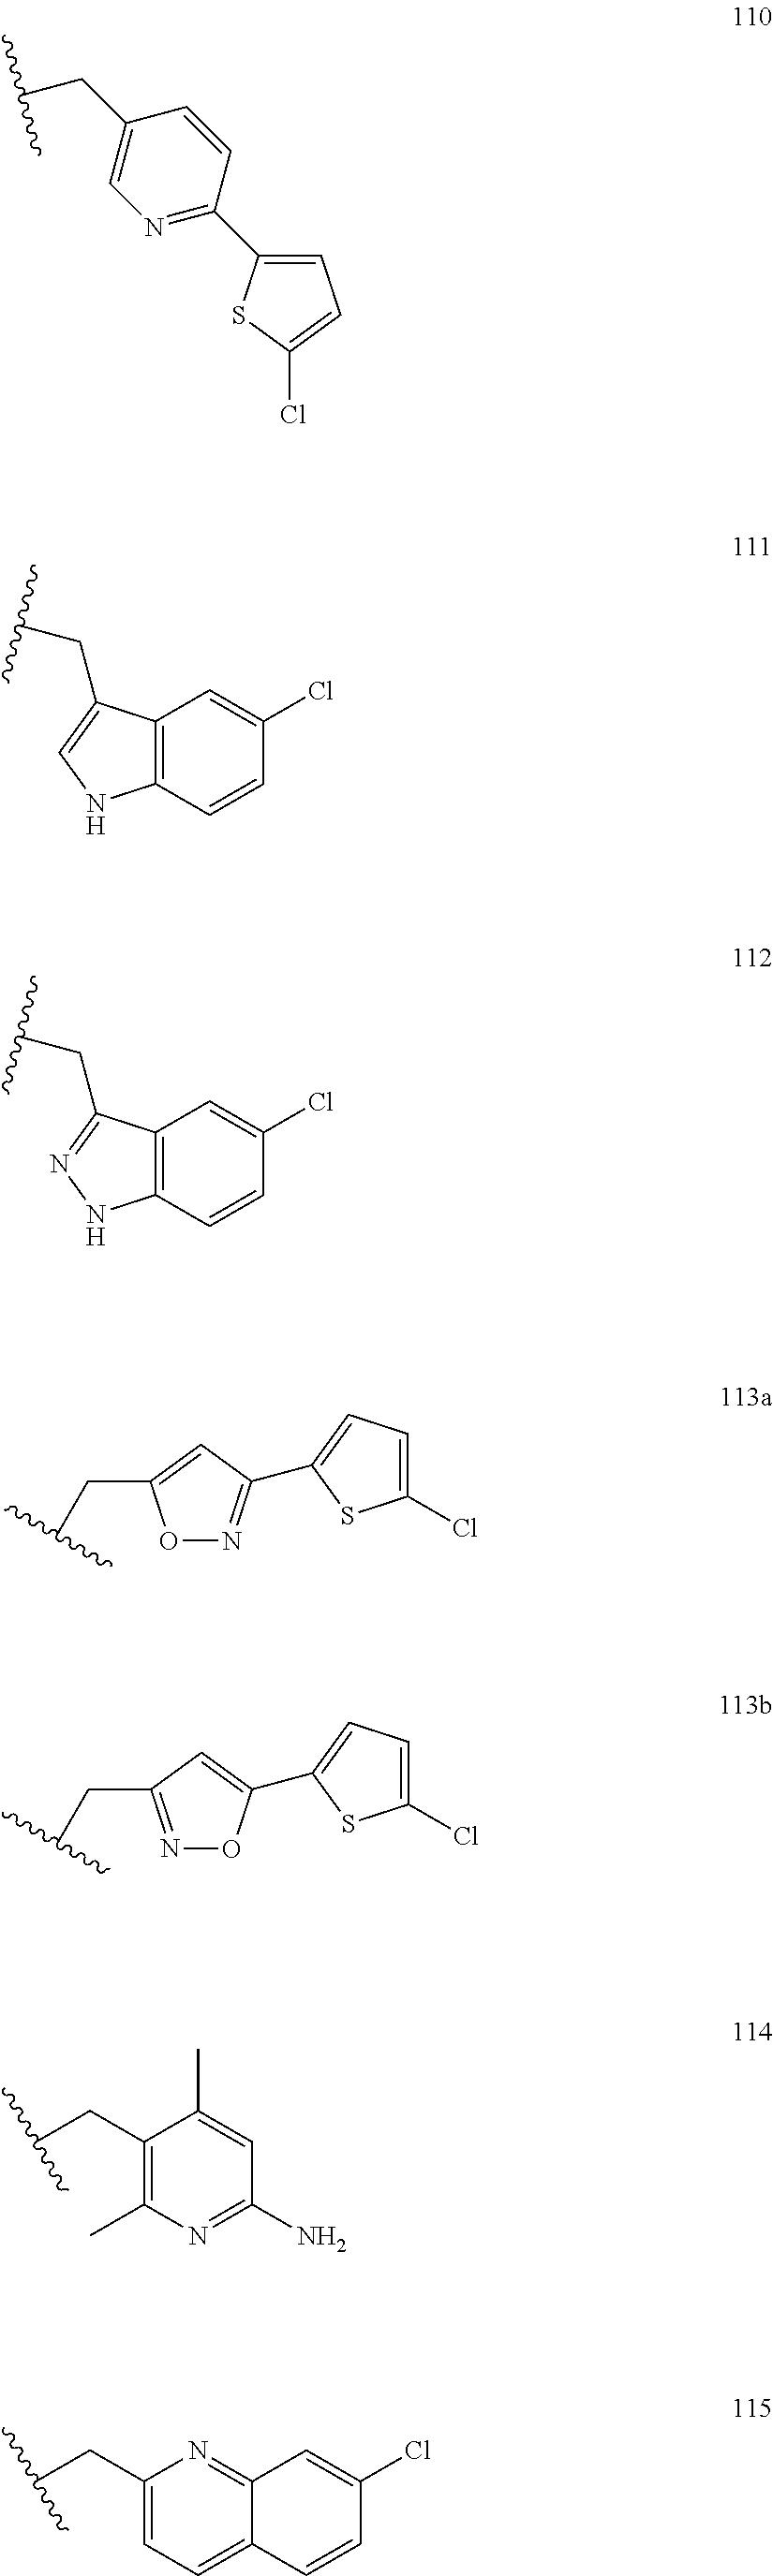 US20150315198A1 - Pyrazolopyridine pyrazolopyrimidine and